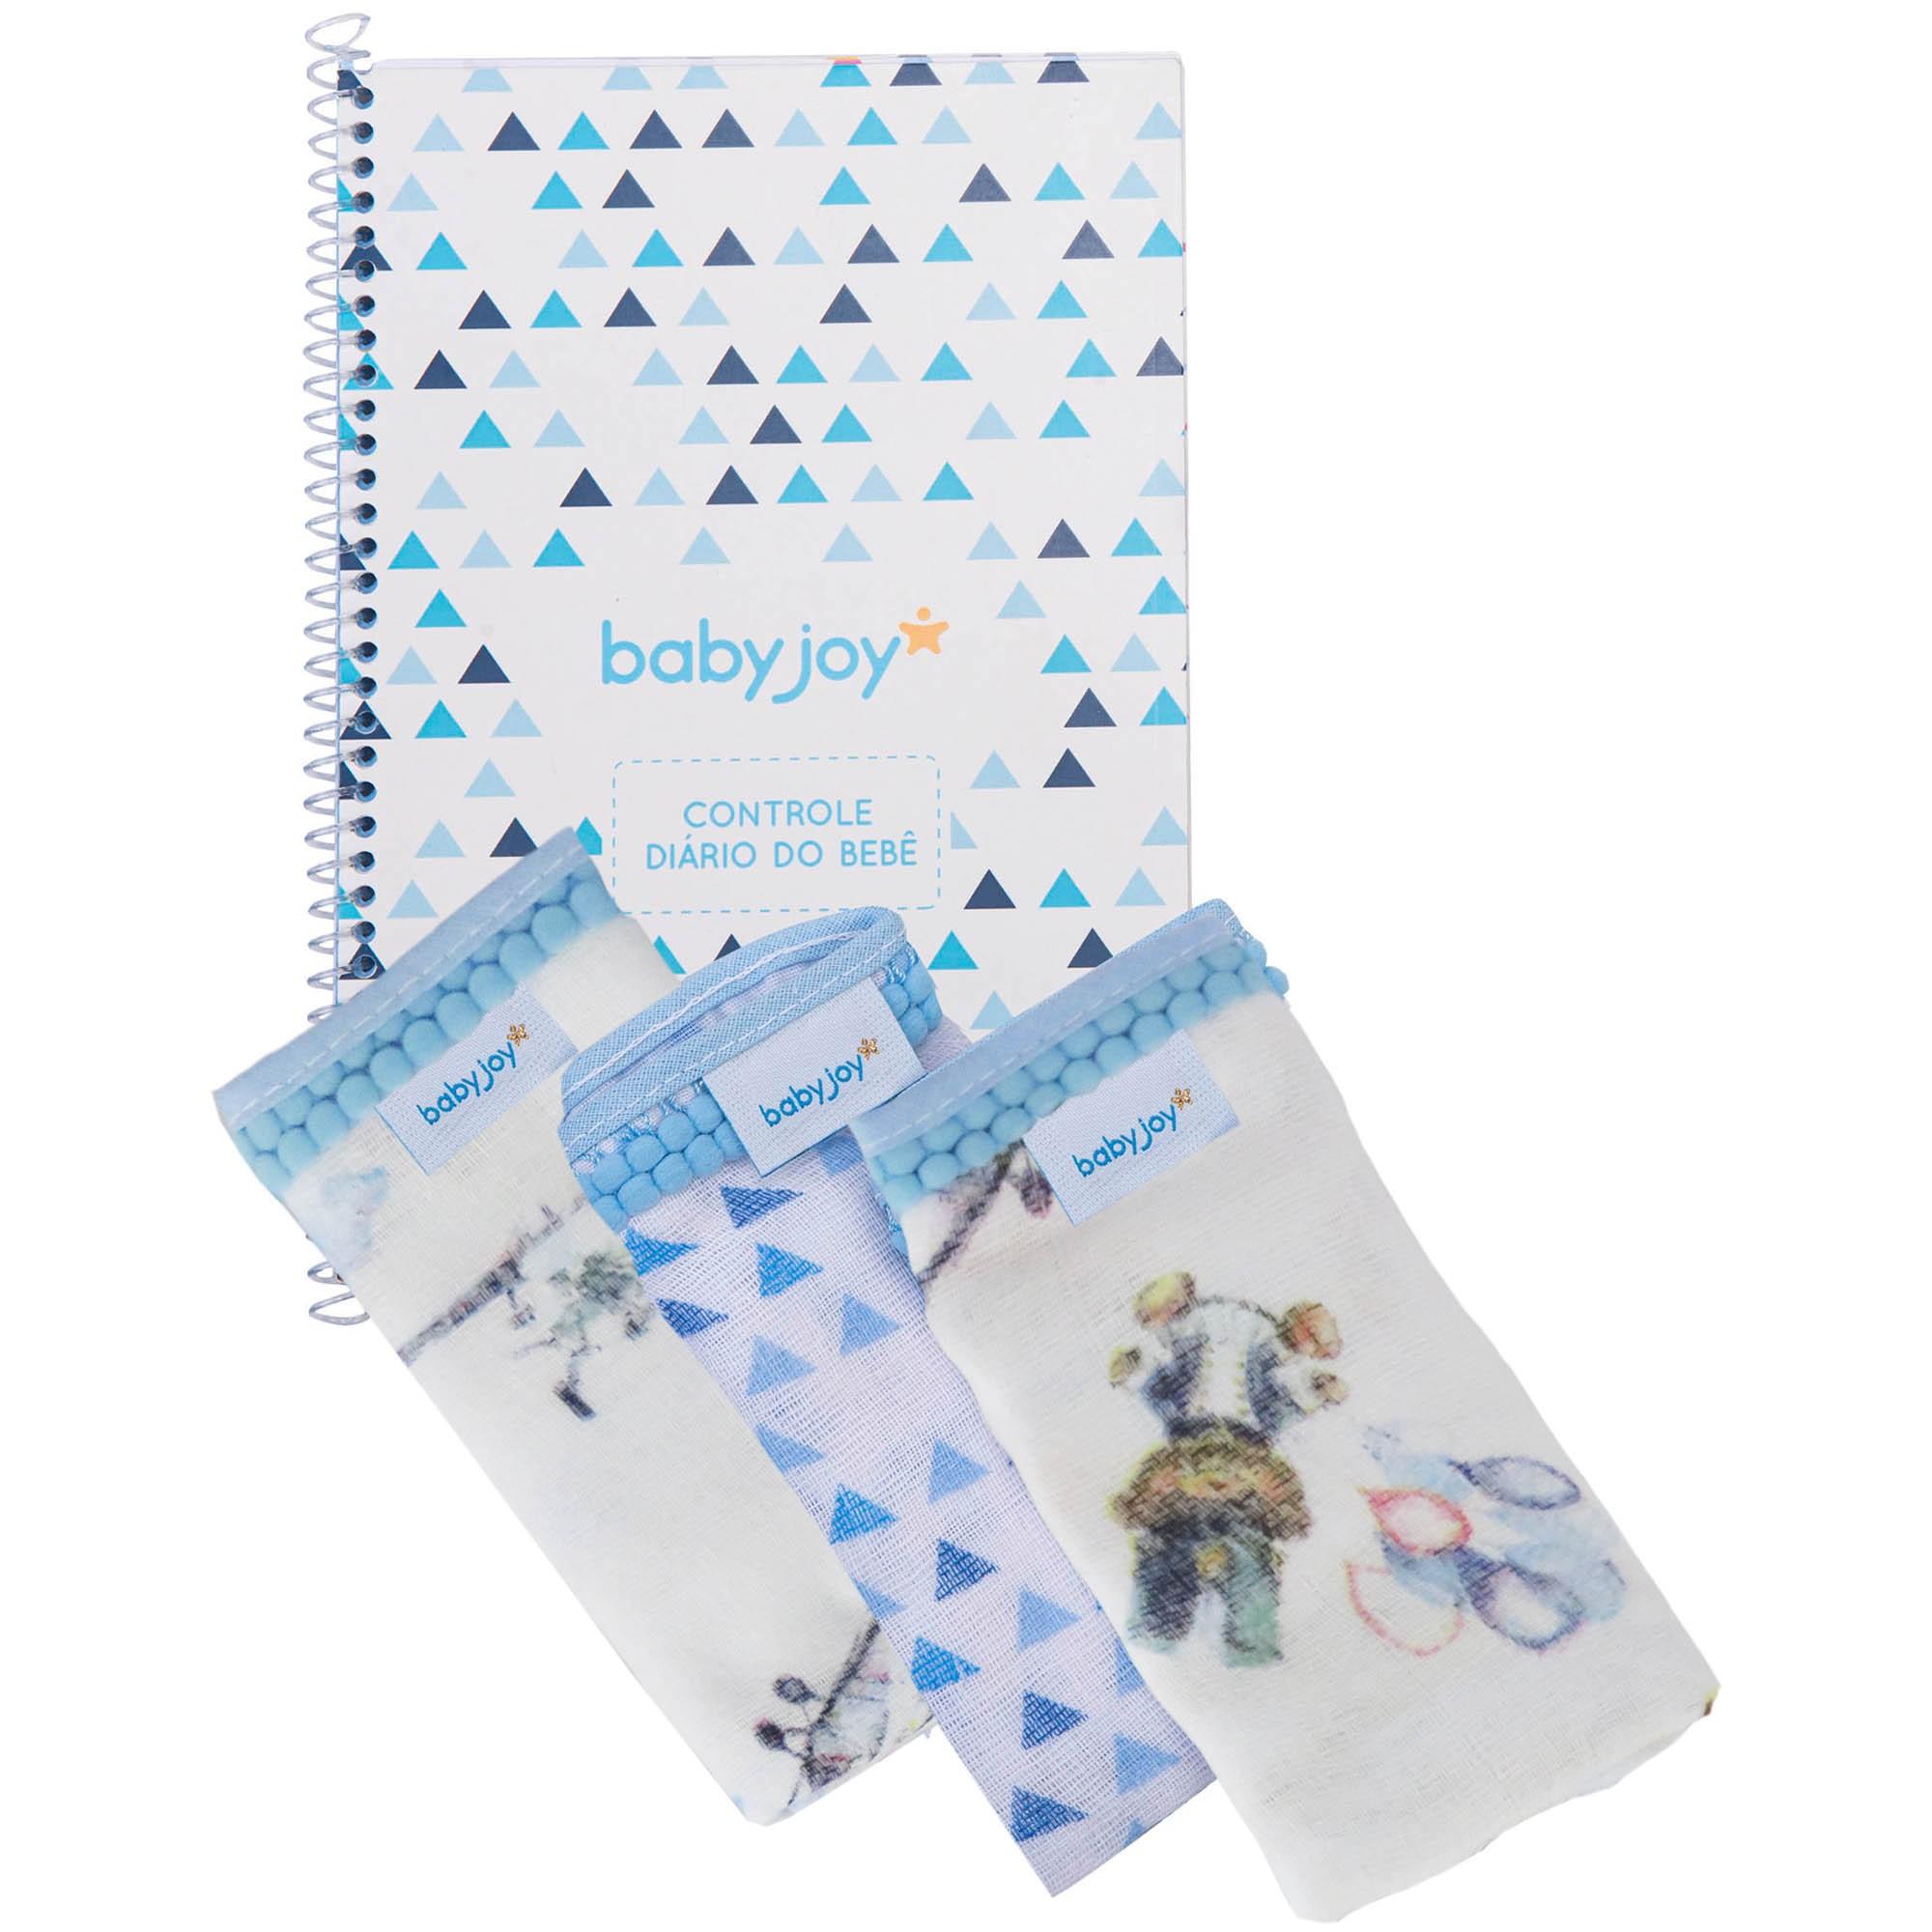 Kit Incomfral Babyjoy - Diário do Bebê